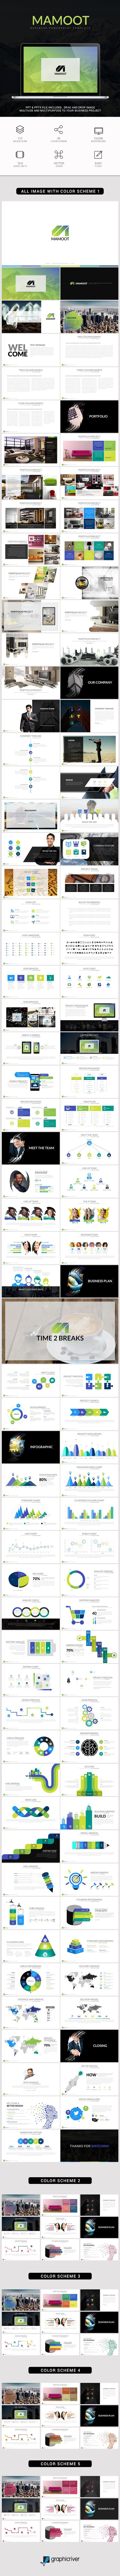 Mamoot Business Powerpoint - Business PowerPoint Templates